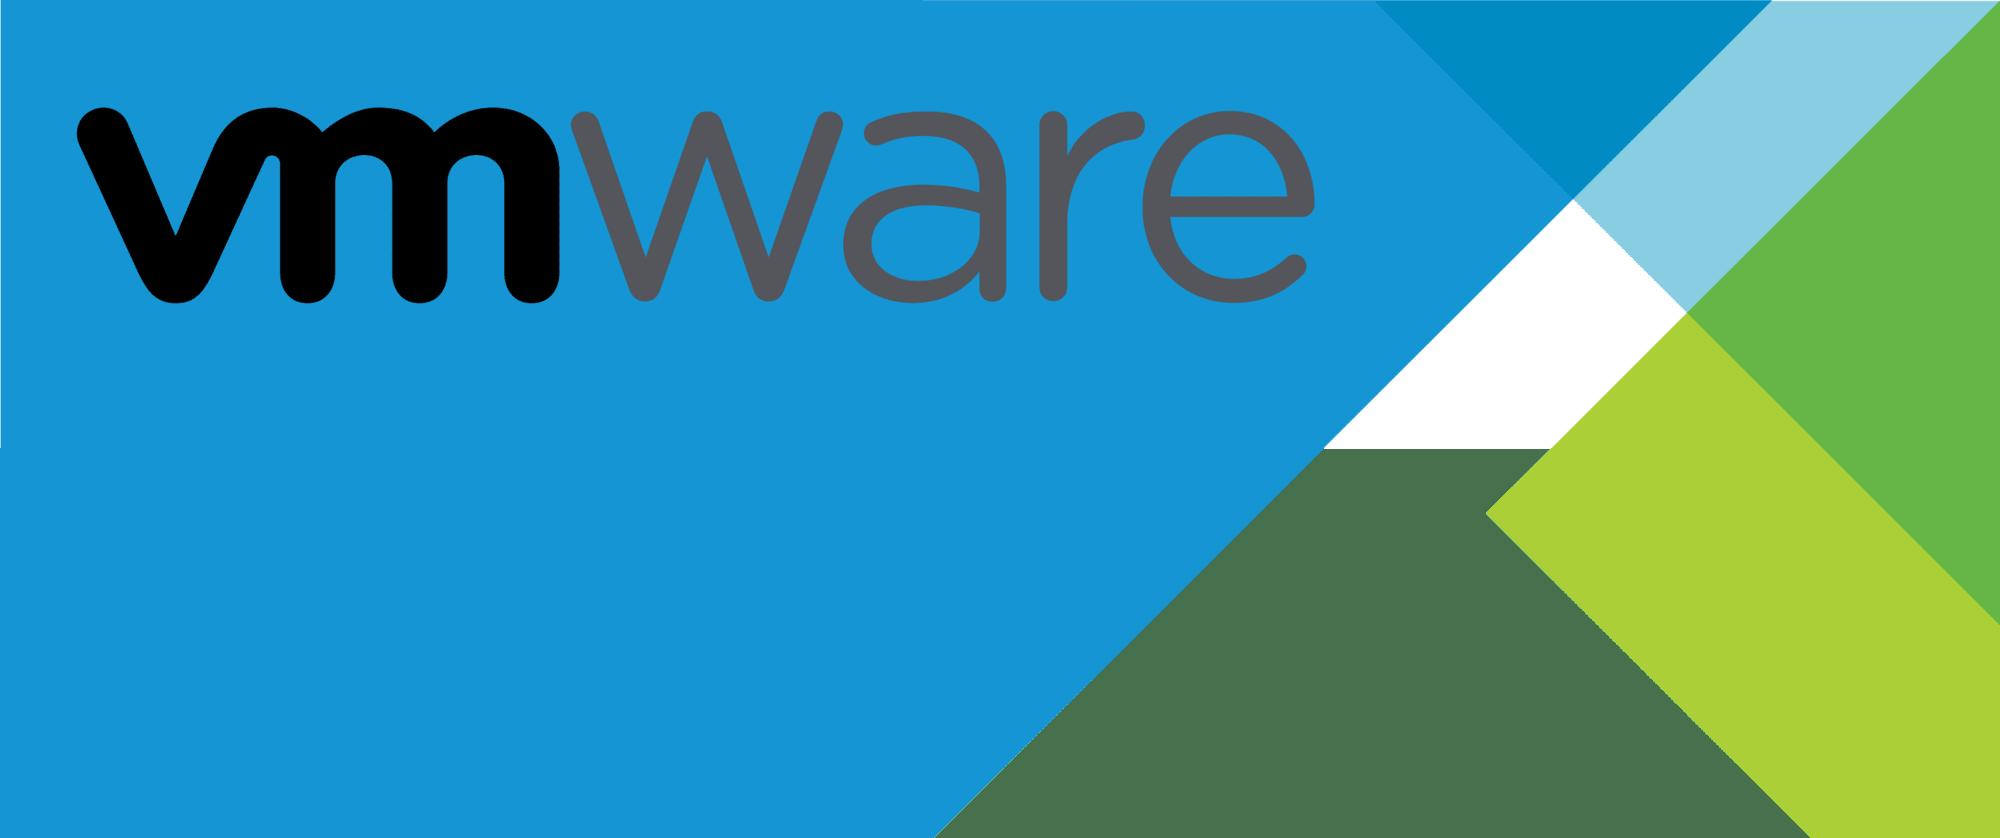 PowerCLI Tutorial: Manage VMware like a Boss